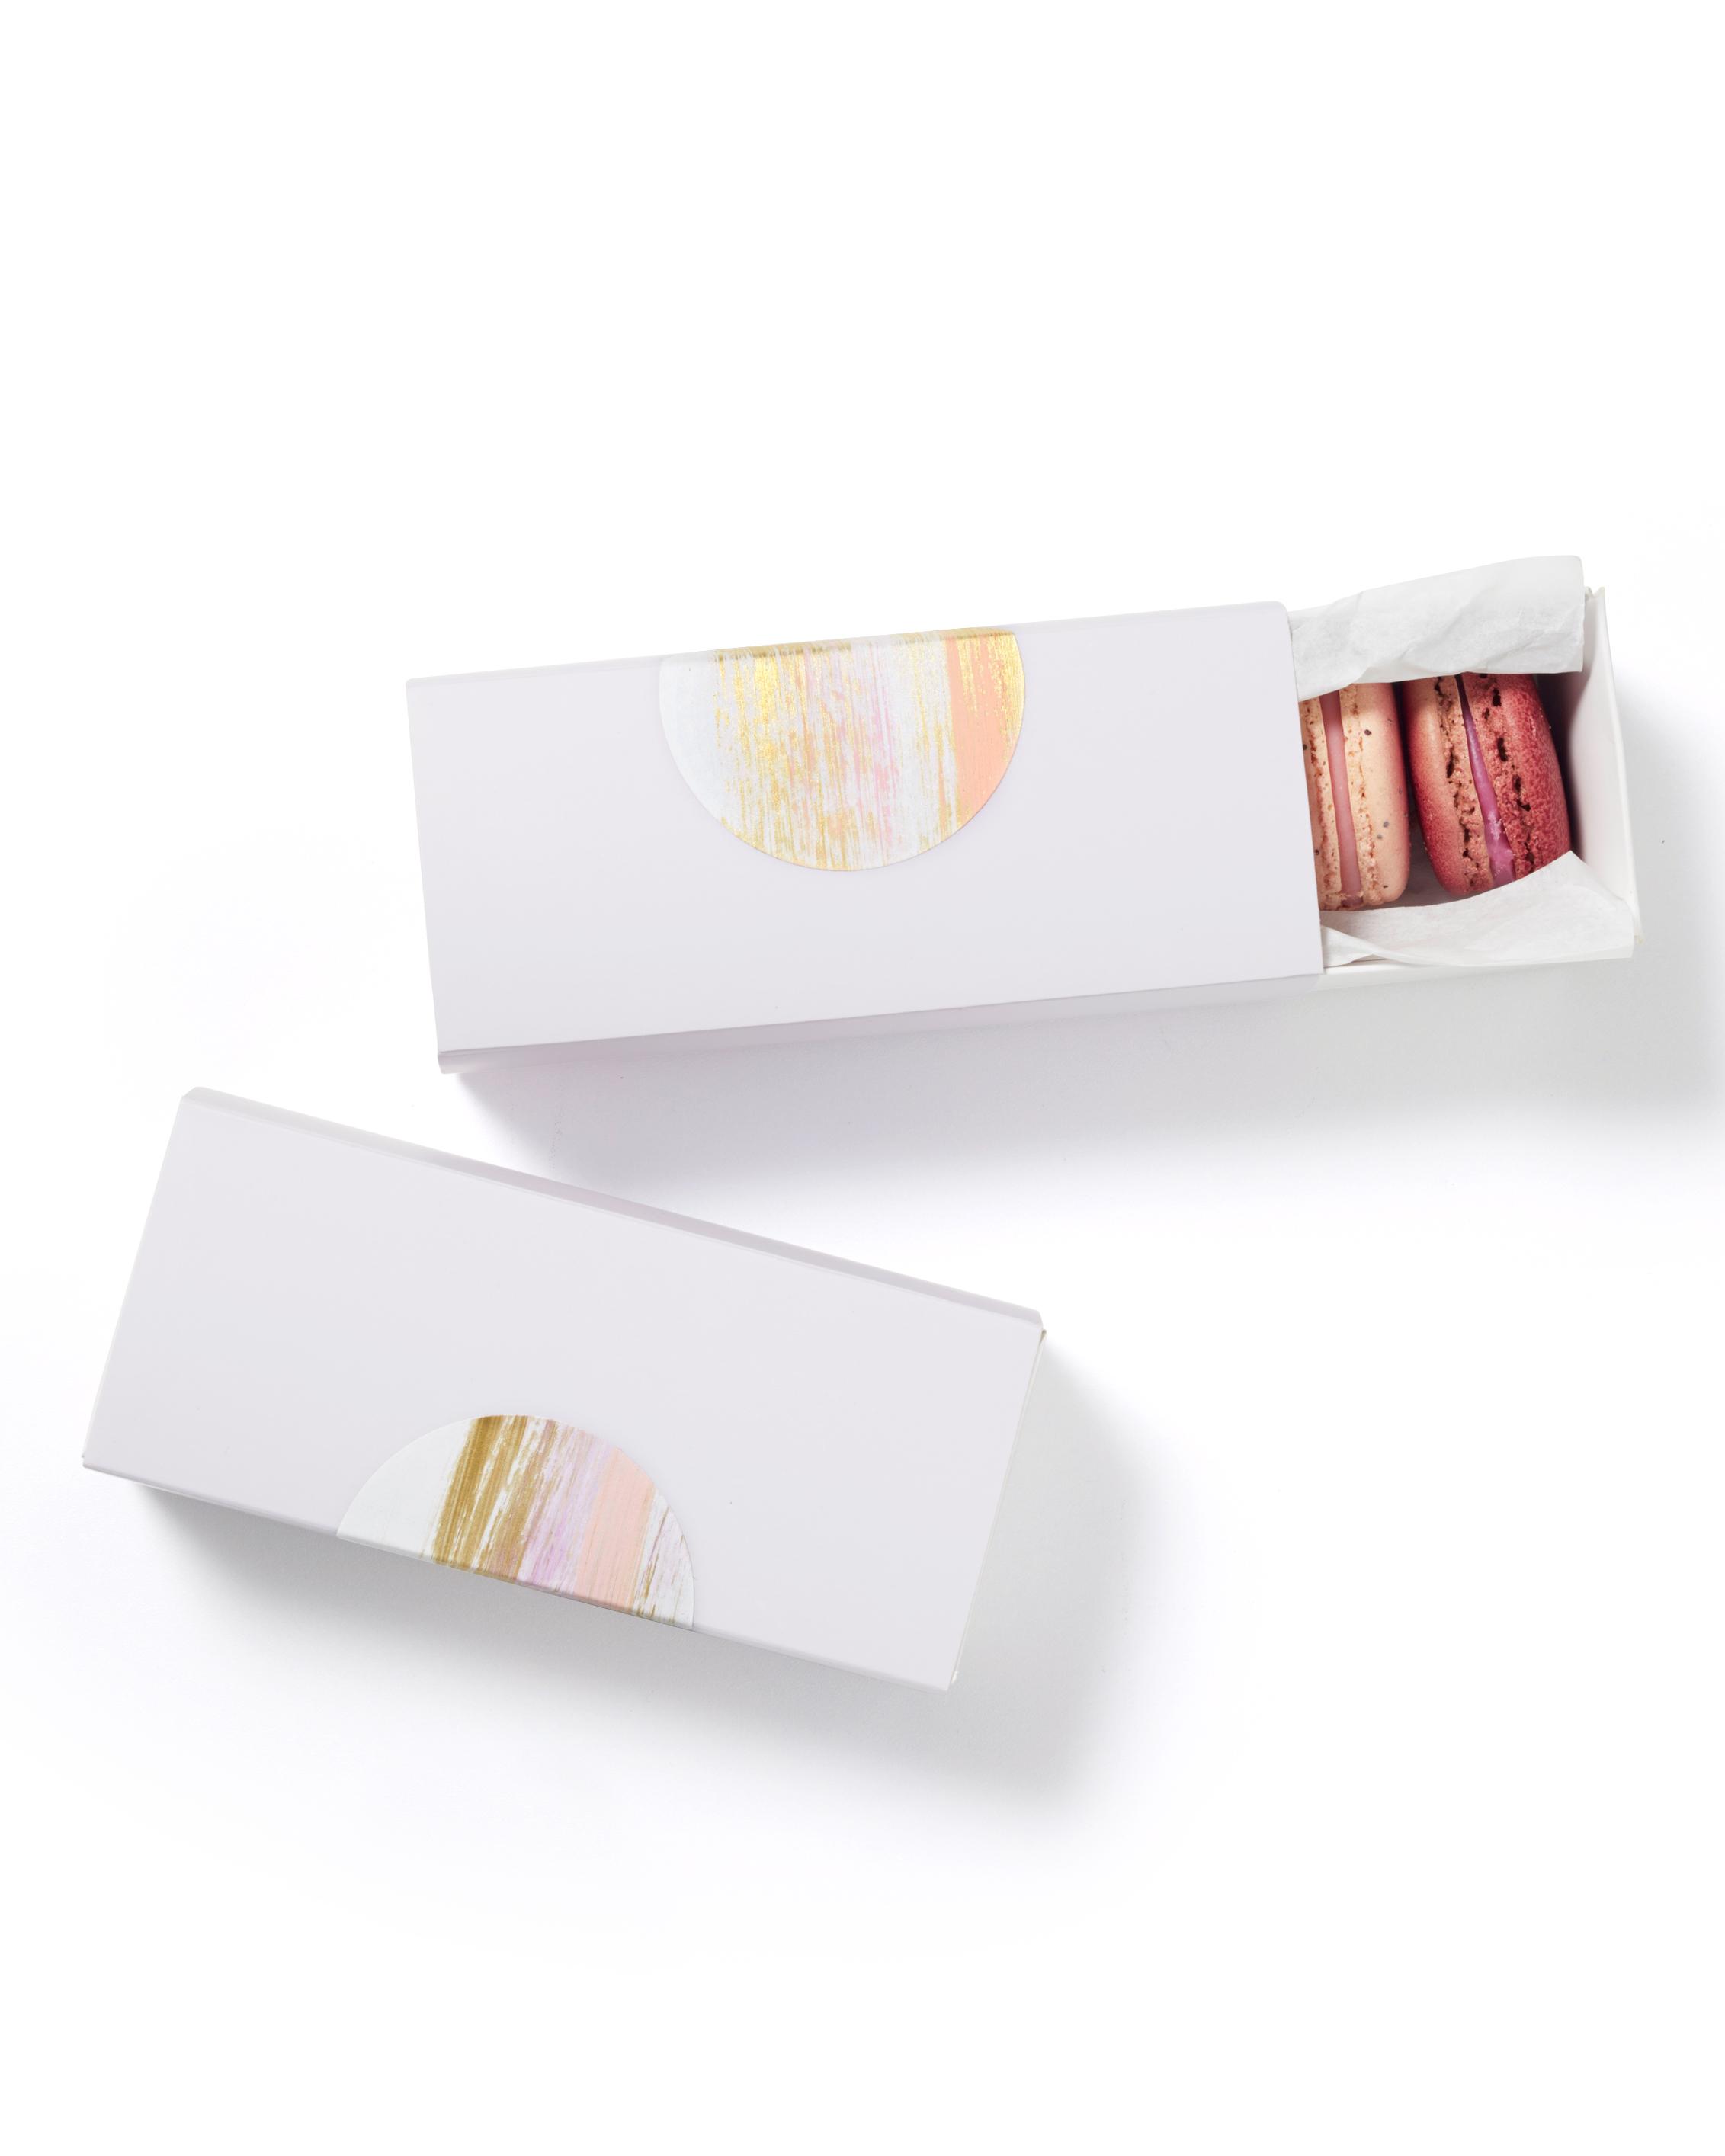 paint-it-sticker-macaroons-136-d112138-0515.jpg